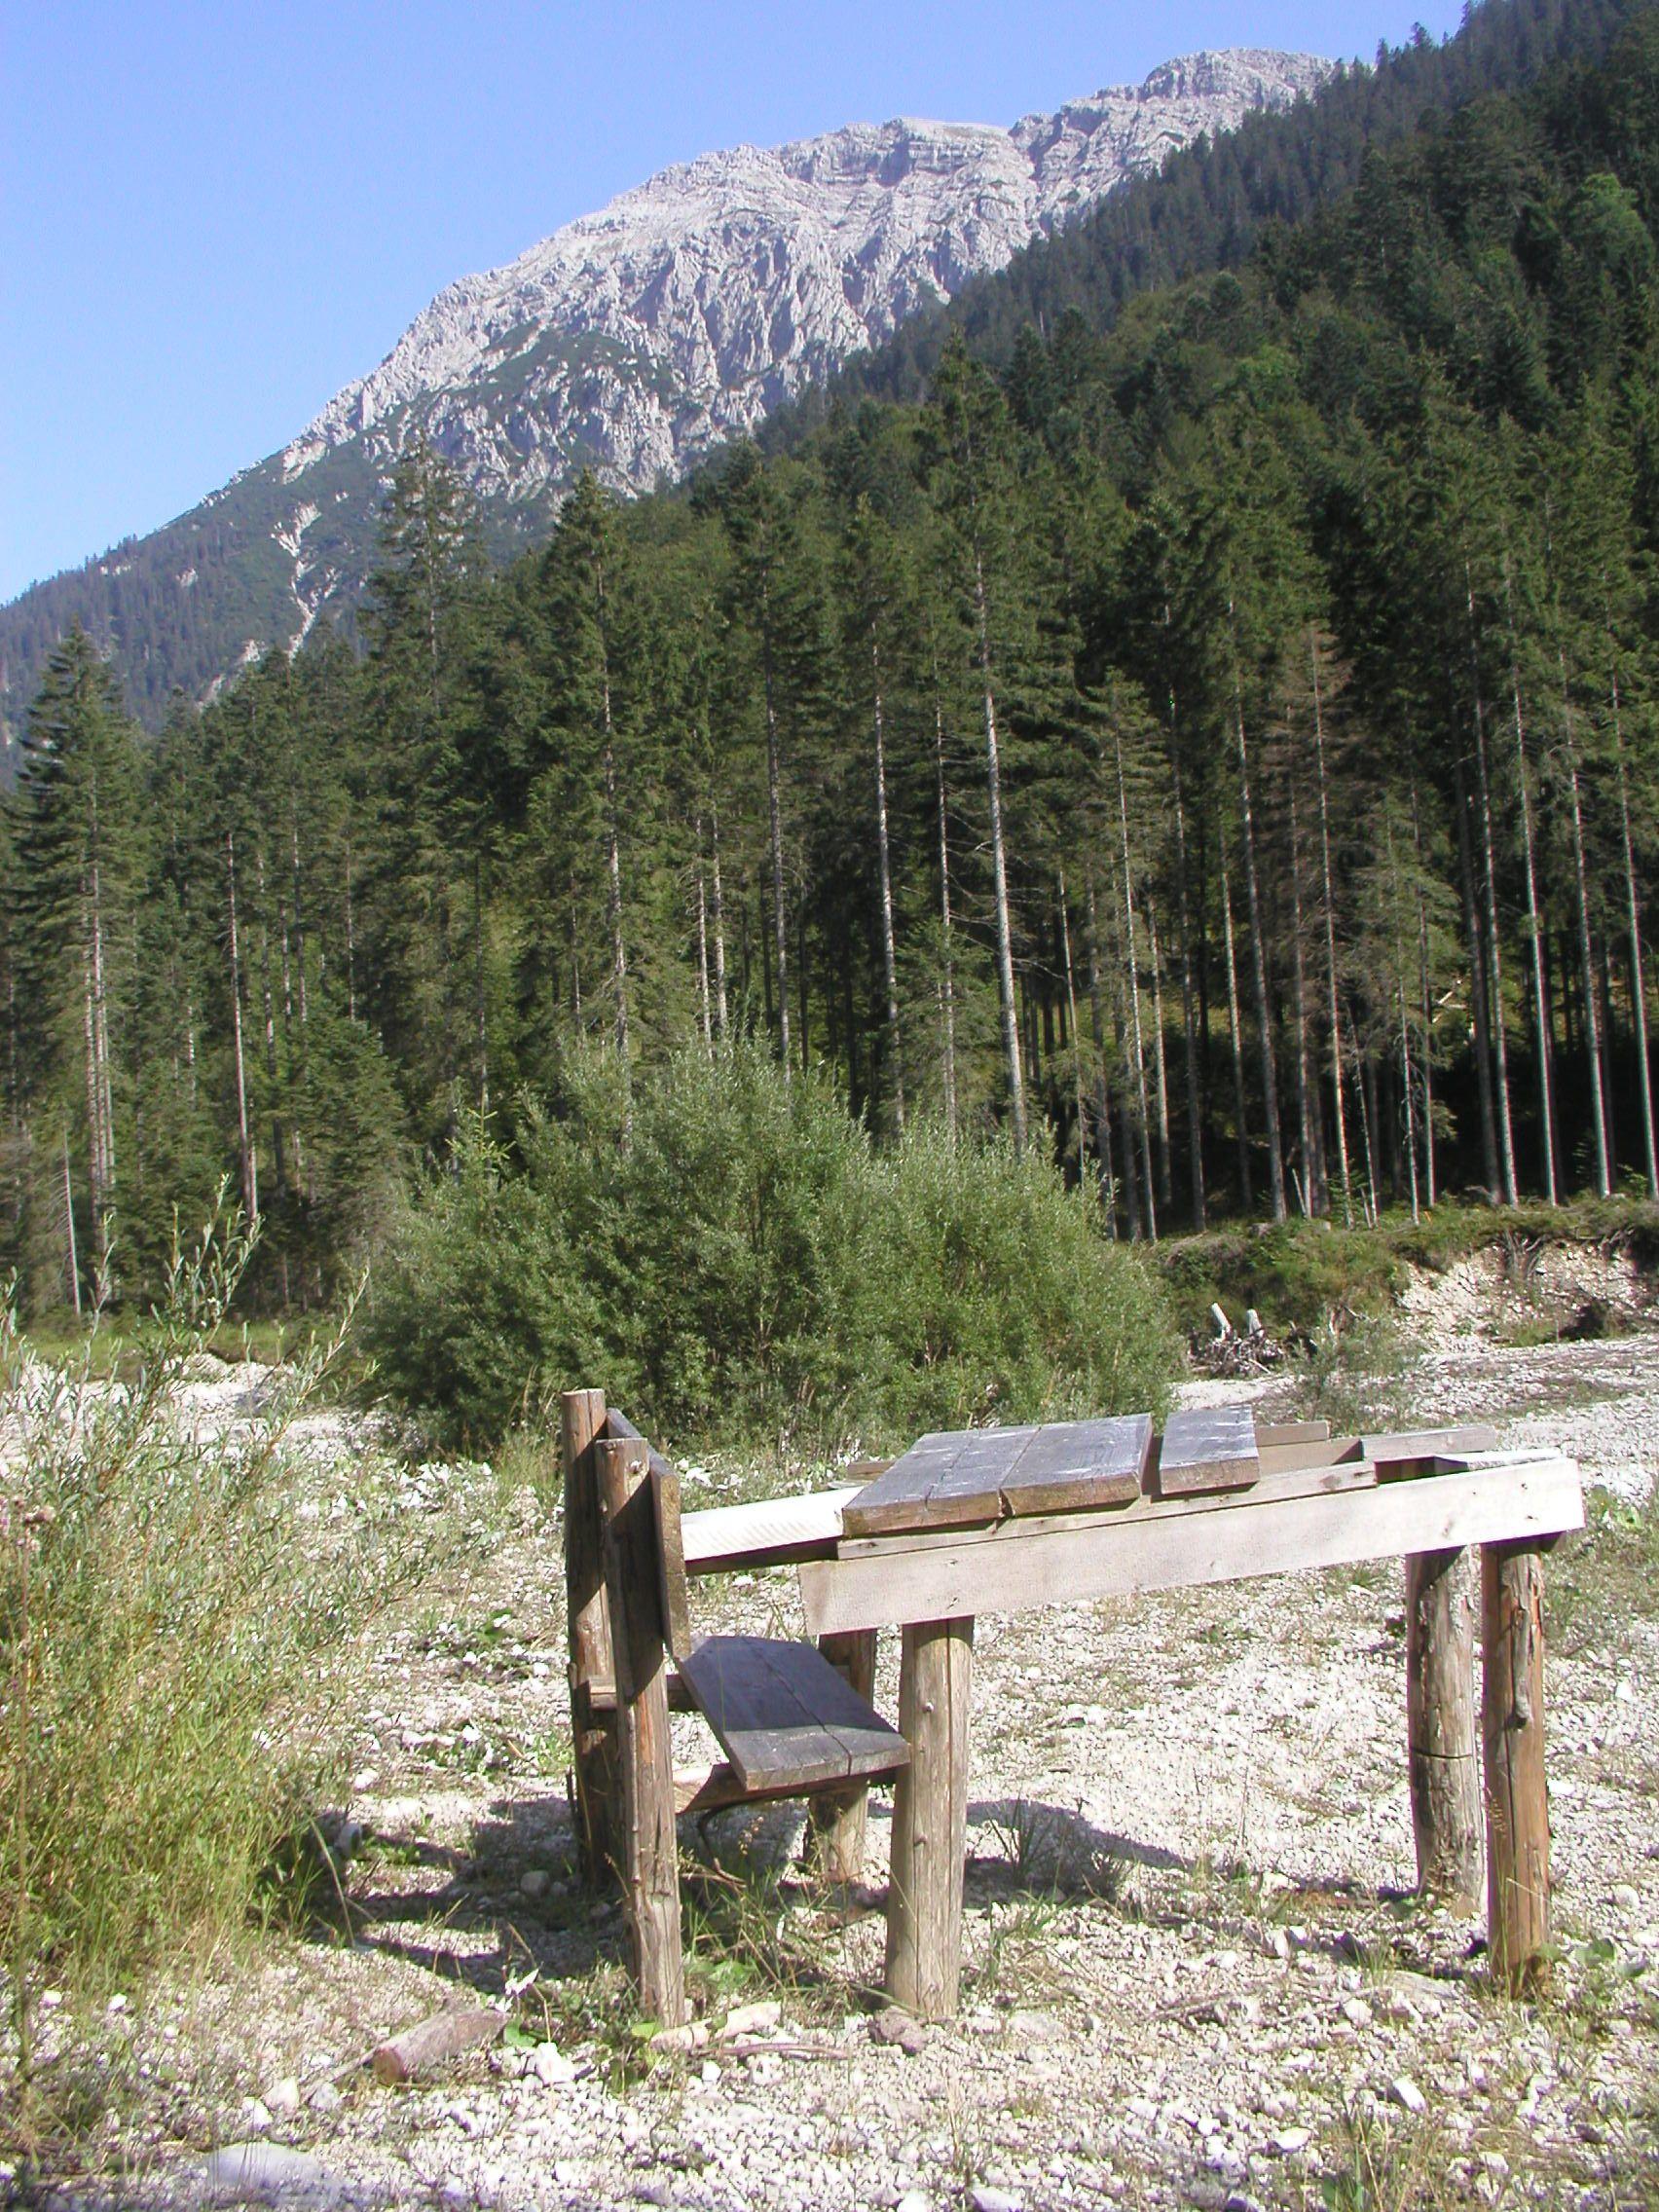 Rastplatz Im Ammertal Austria Nature Travel Mountains